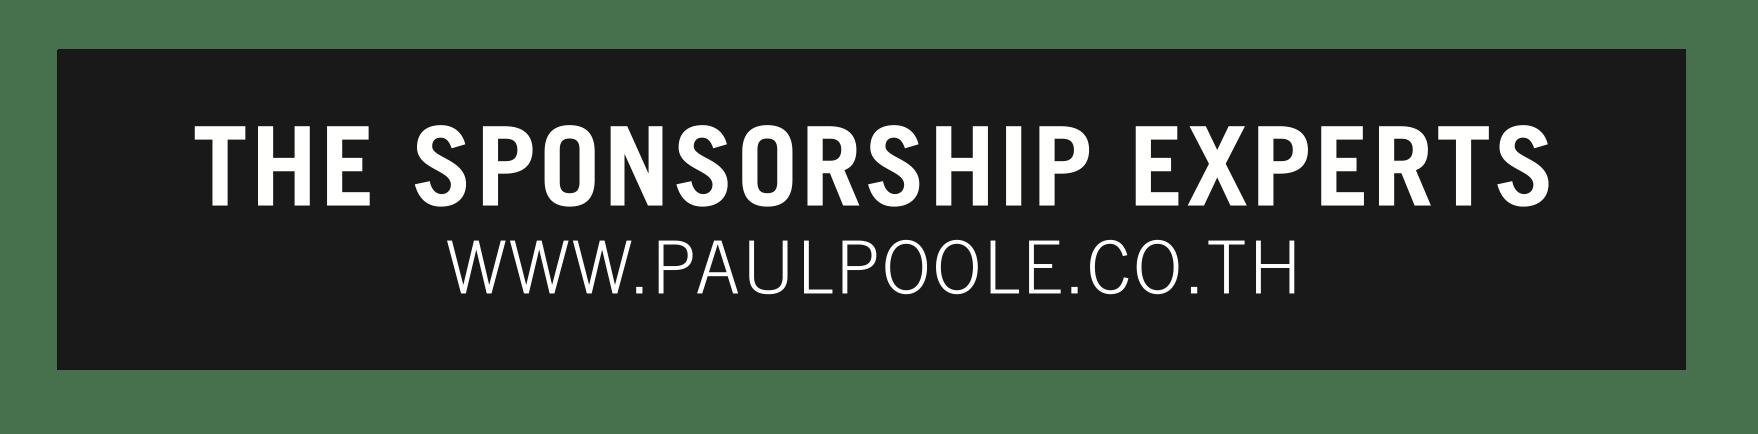 Paul Poole Sponsorship Experts - Thailand International Boat Show